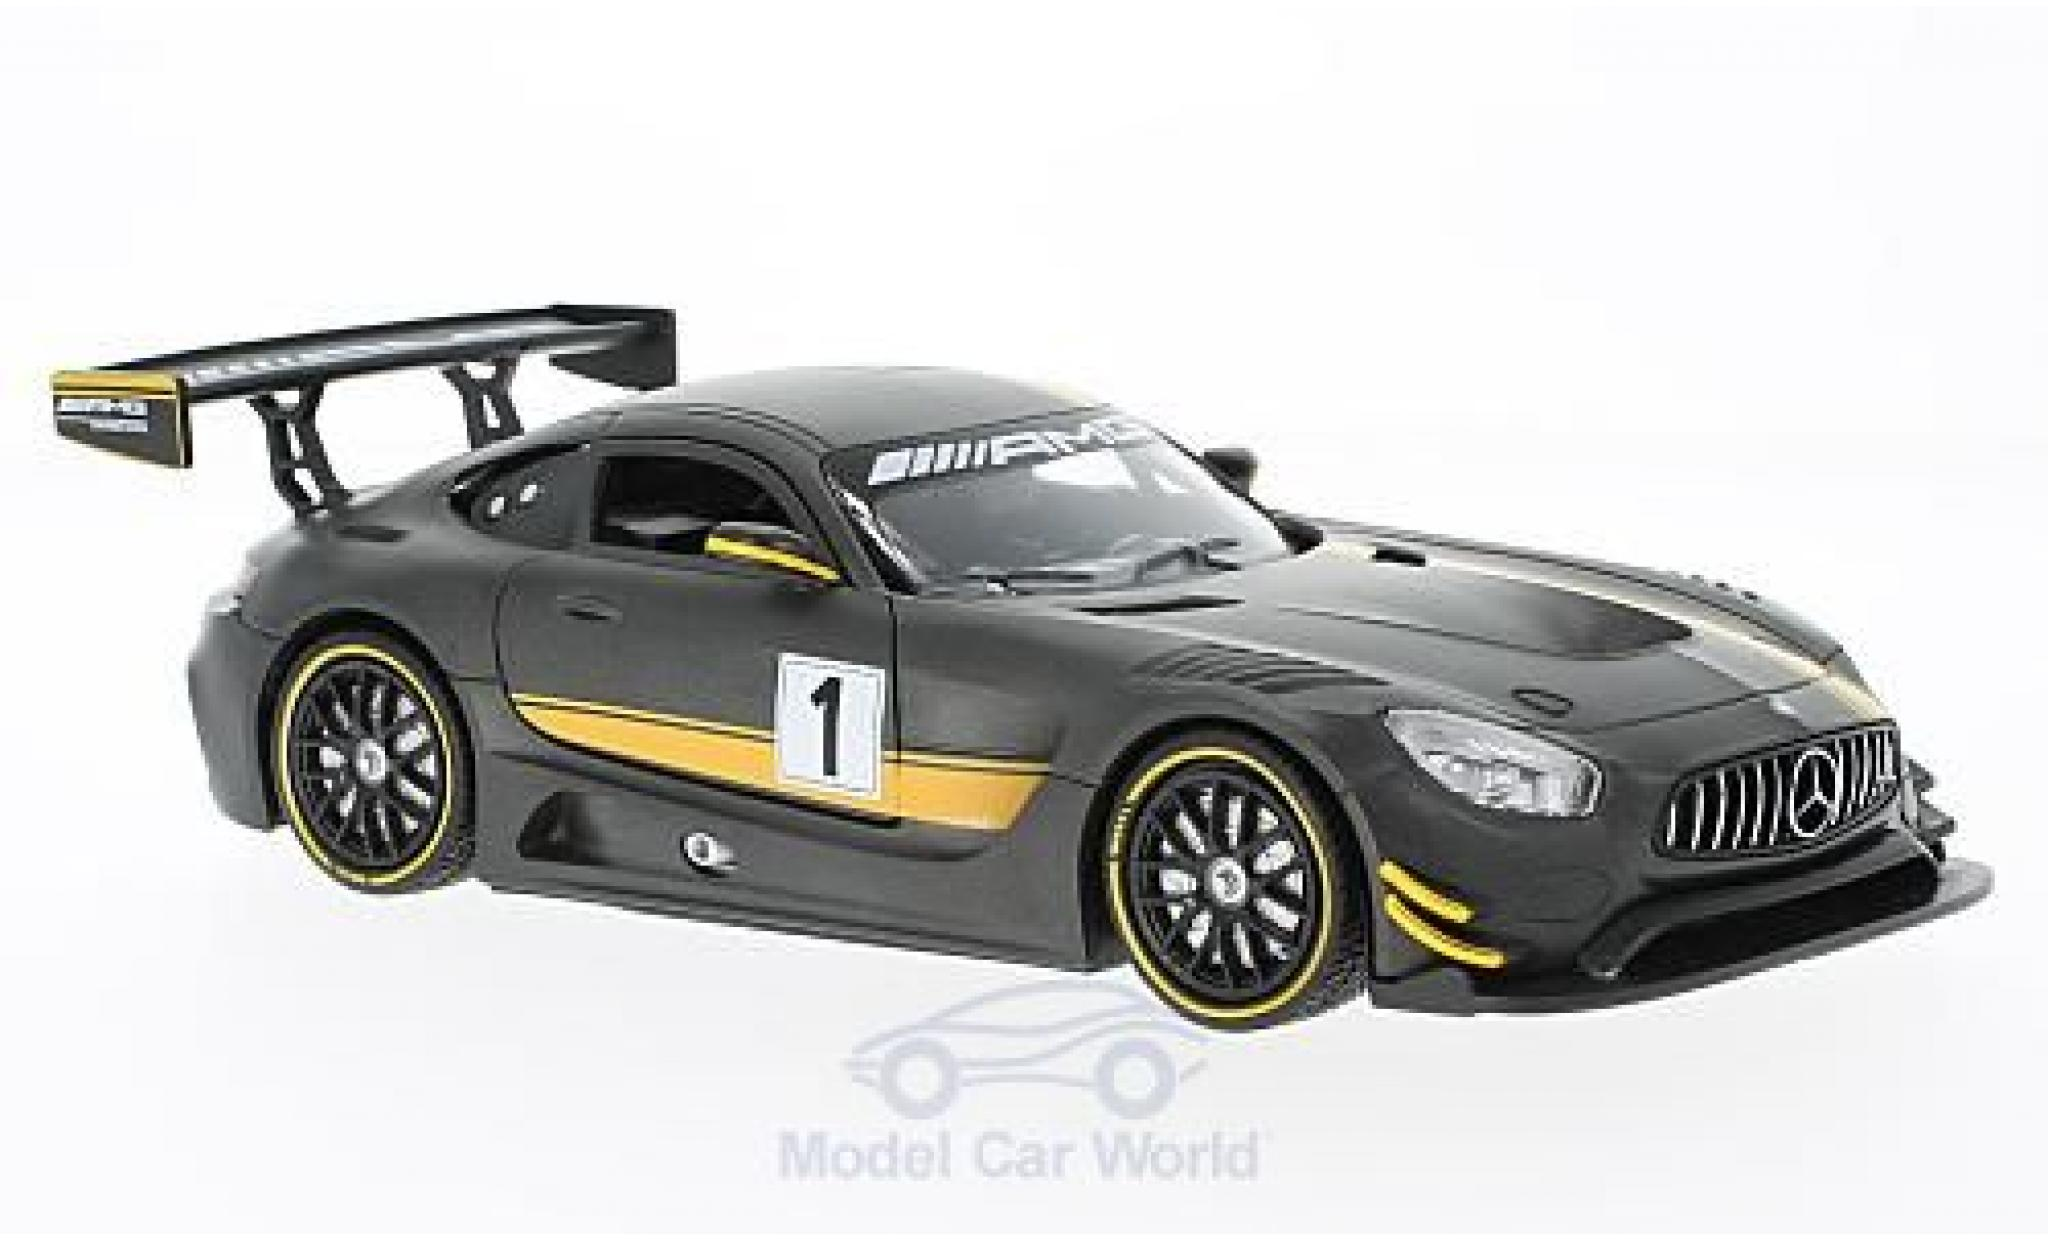 Mercedes AMG GT 1/24 Motormax 3 matt-grey Presentation